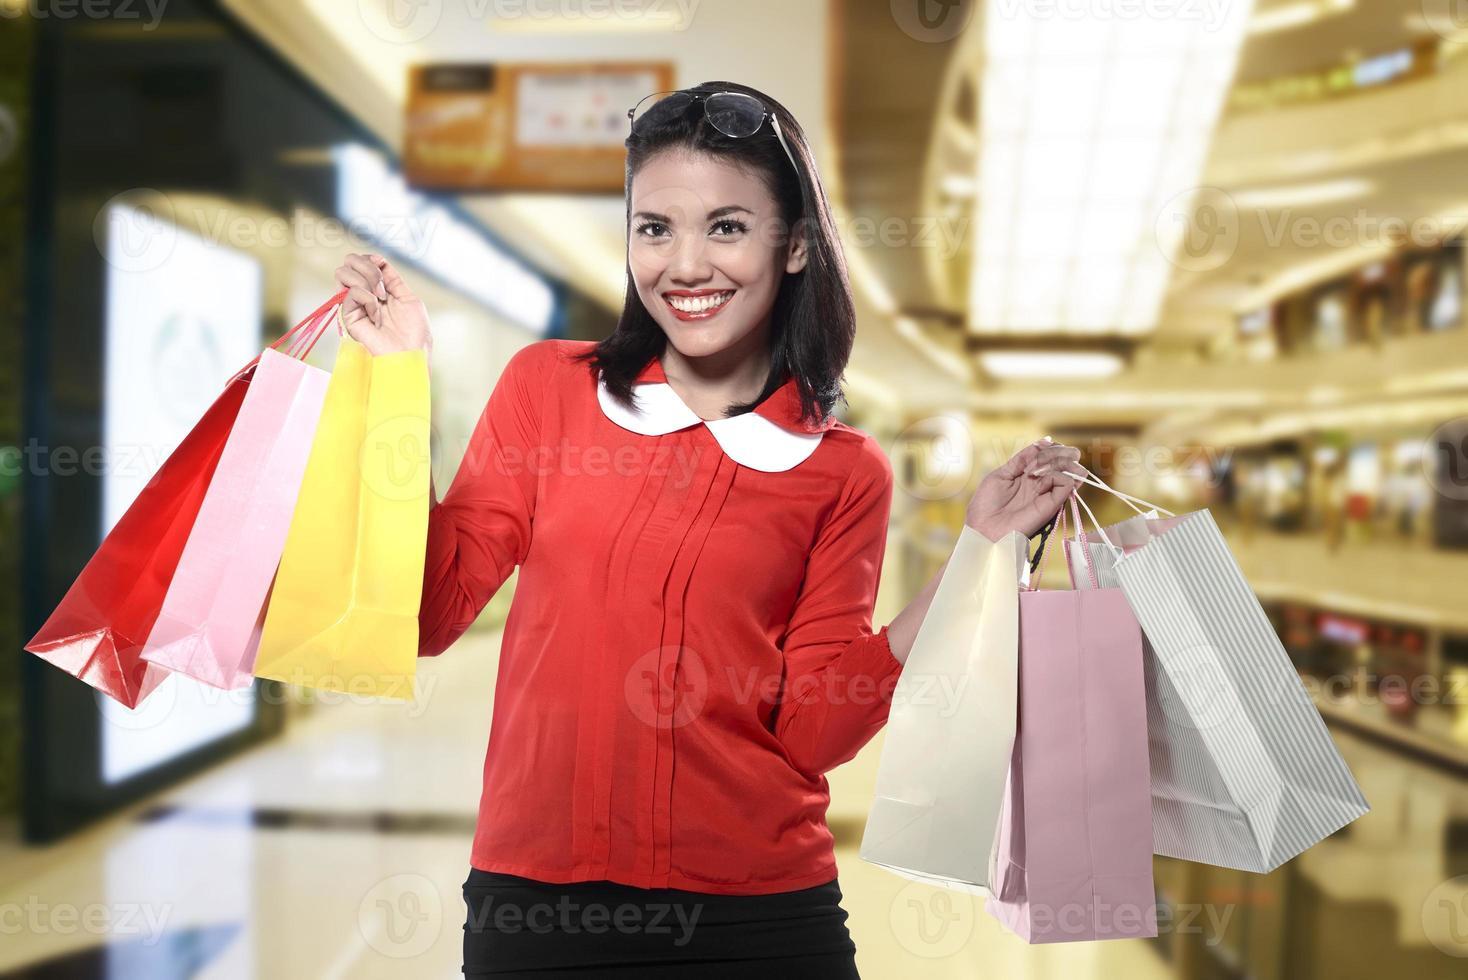 femme asiatique, tenue, sac à provisions photo